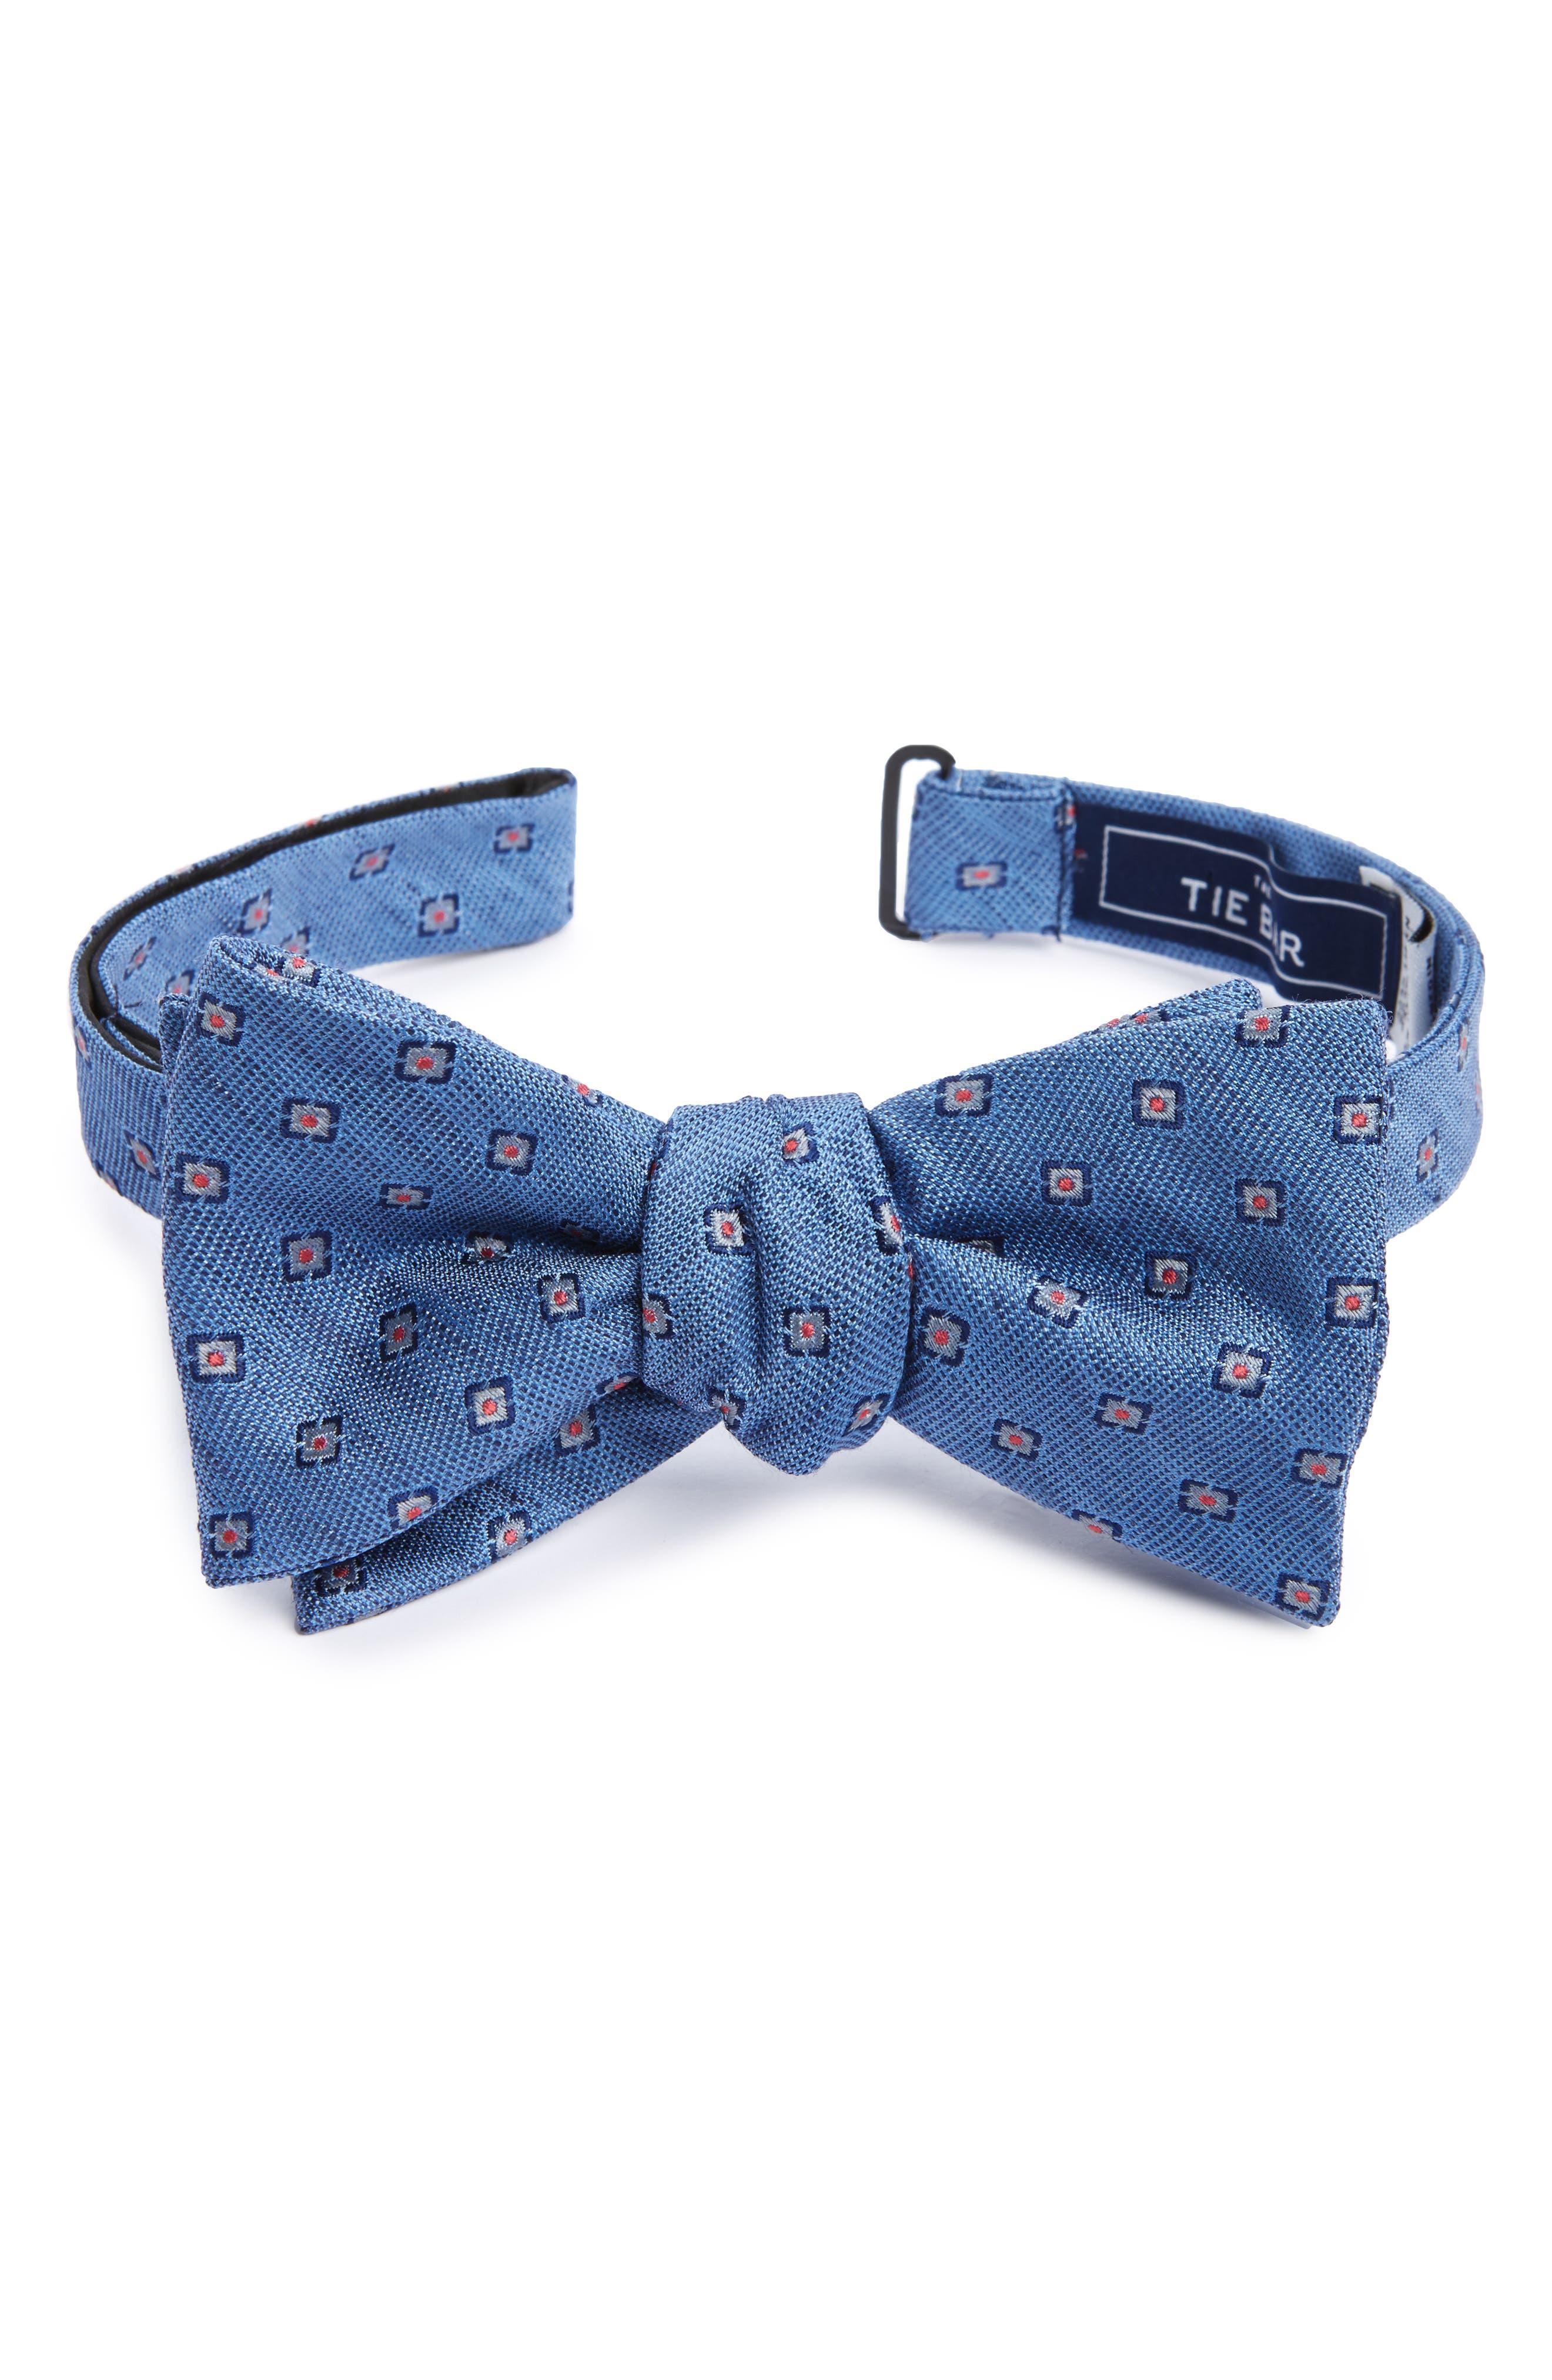 Alternate Image 1 Selected - The Tie Bar Medallion Scene Silk & Linen Bow Tie